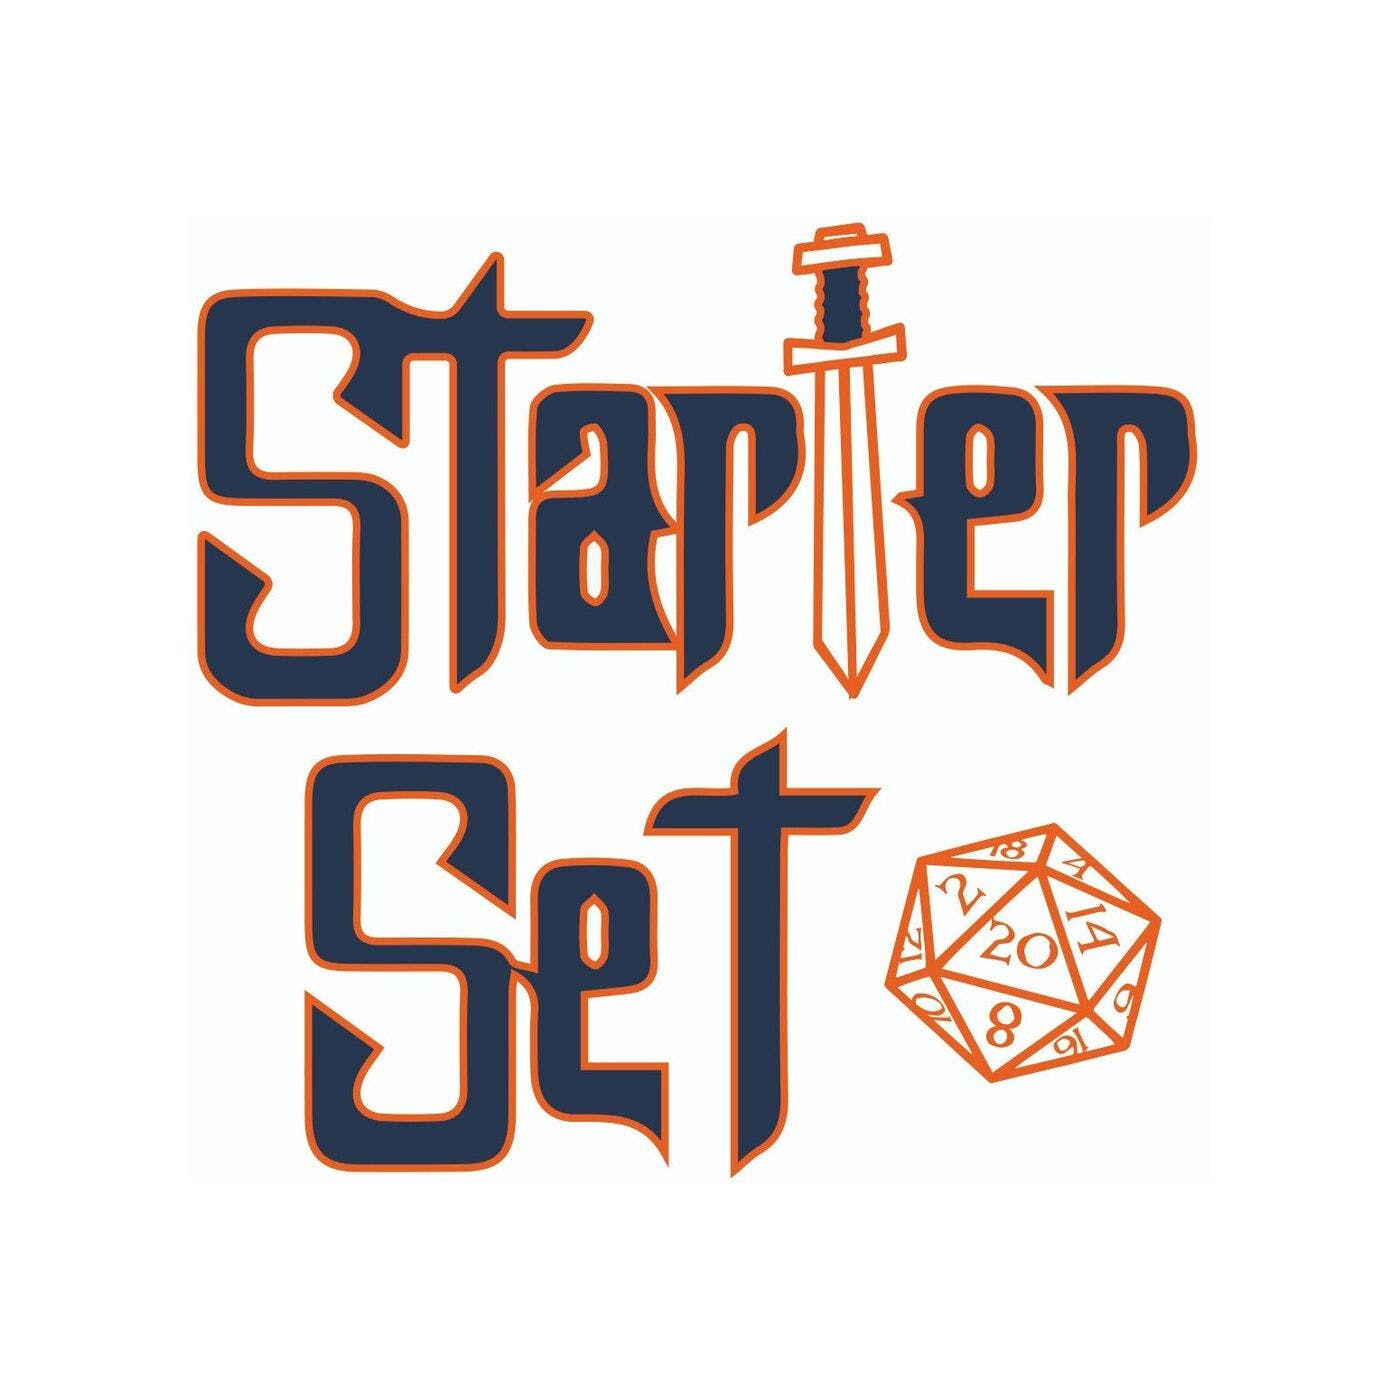 Starter Set - A Dungeons & Dragons podcast